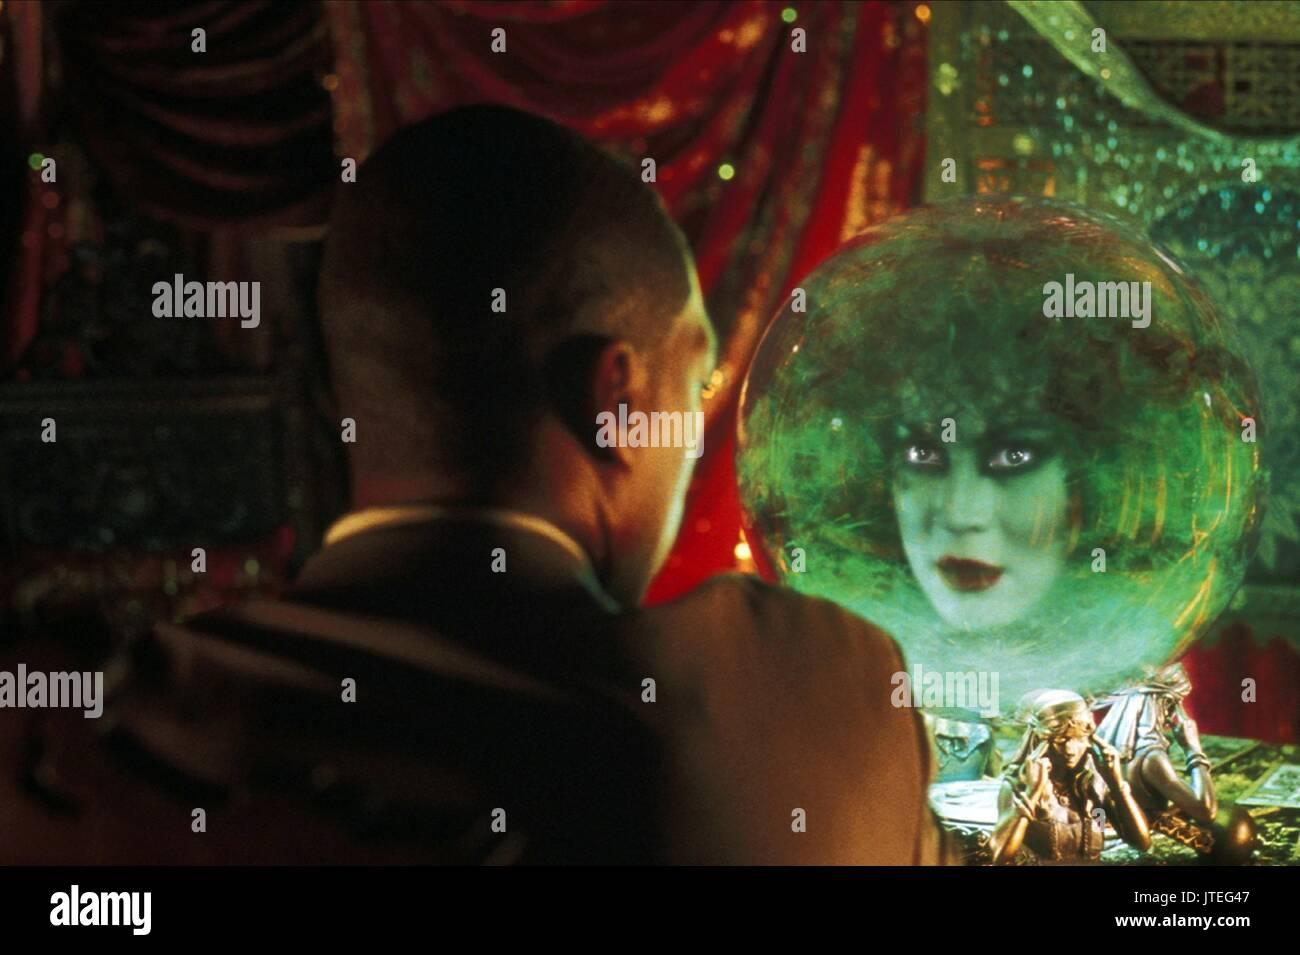 Eddie Murphy Jennifer Tilly The Haunted Mansion 2003 Stock Photo Alamy